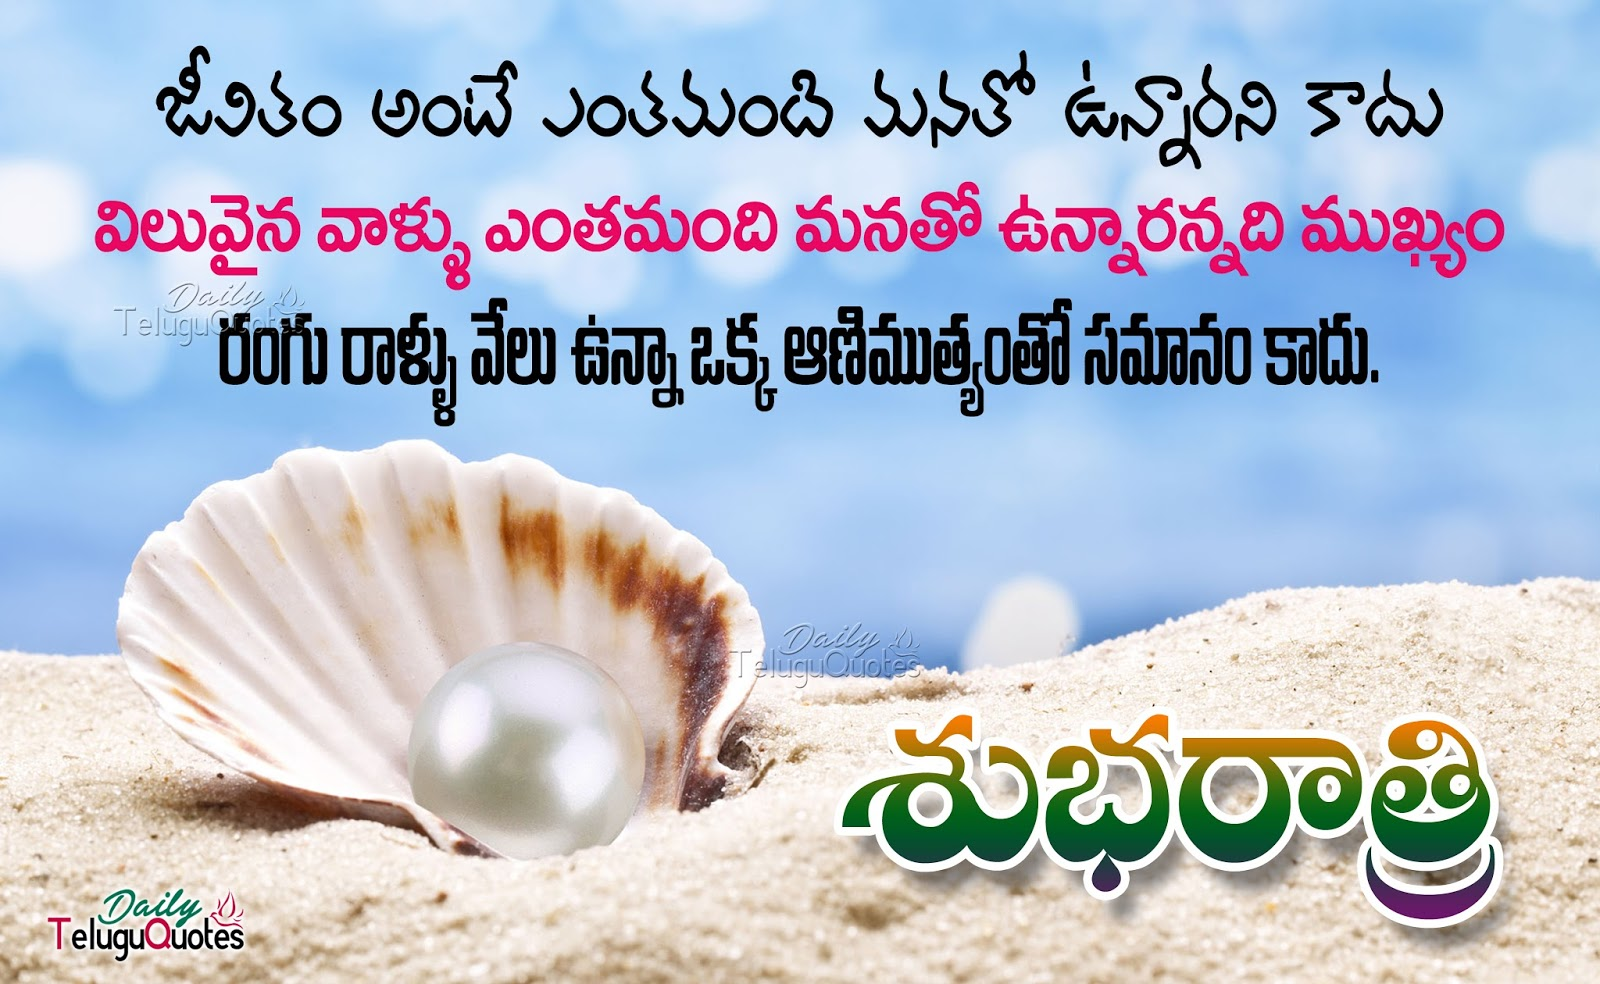 Good Night Quotes Wishes Greetings In Telugu Language